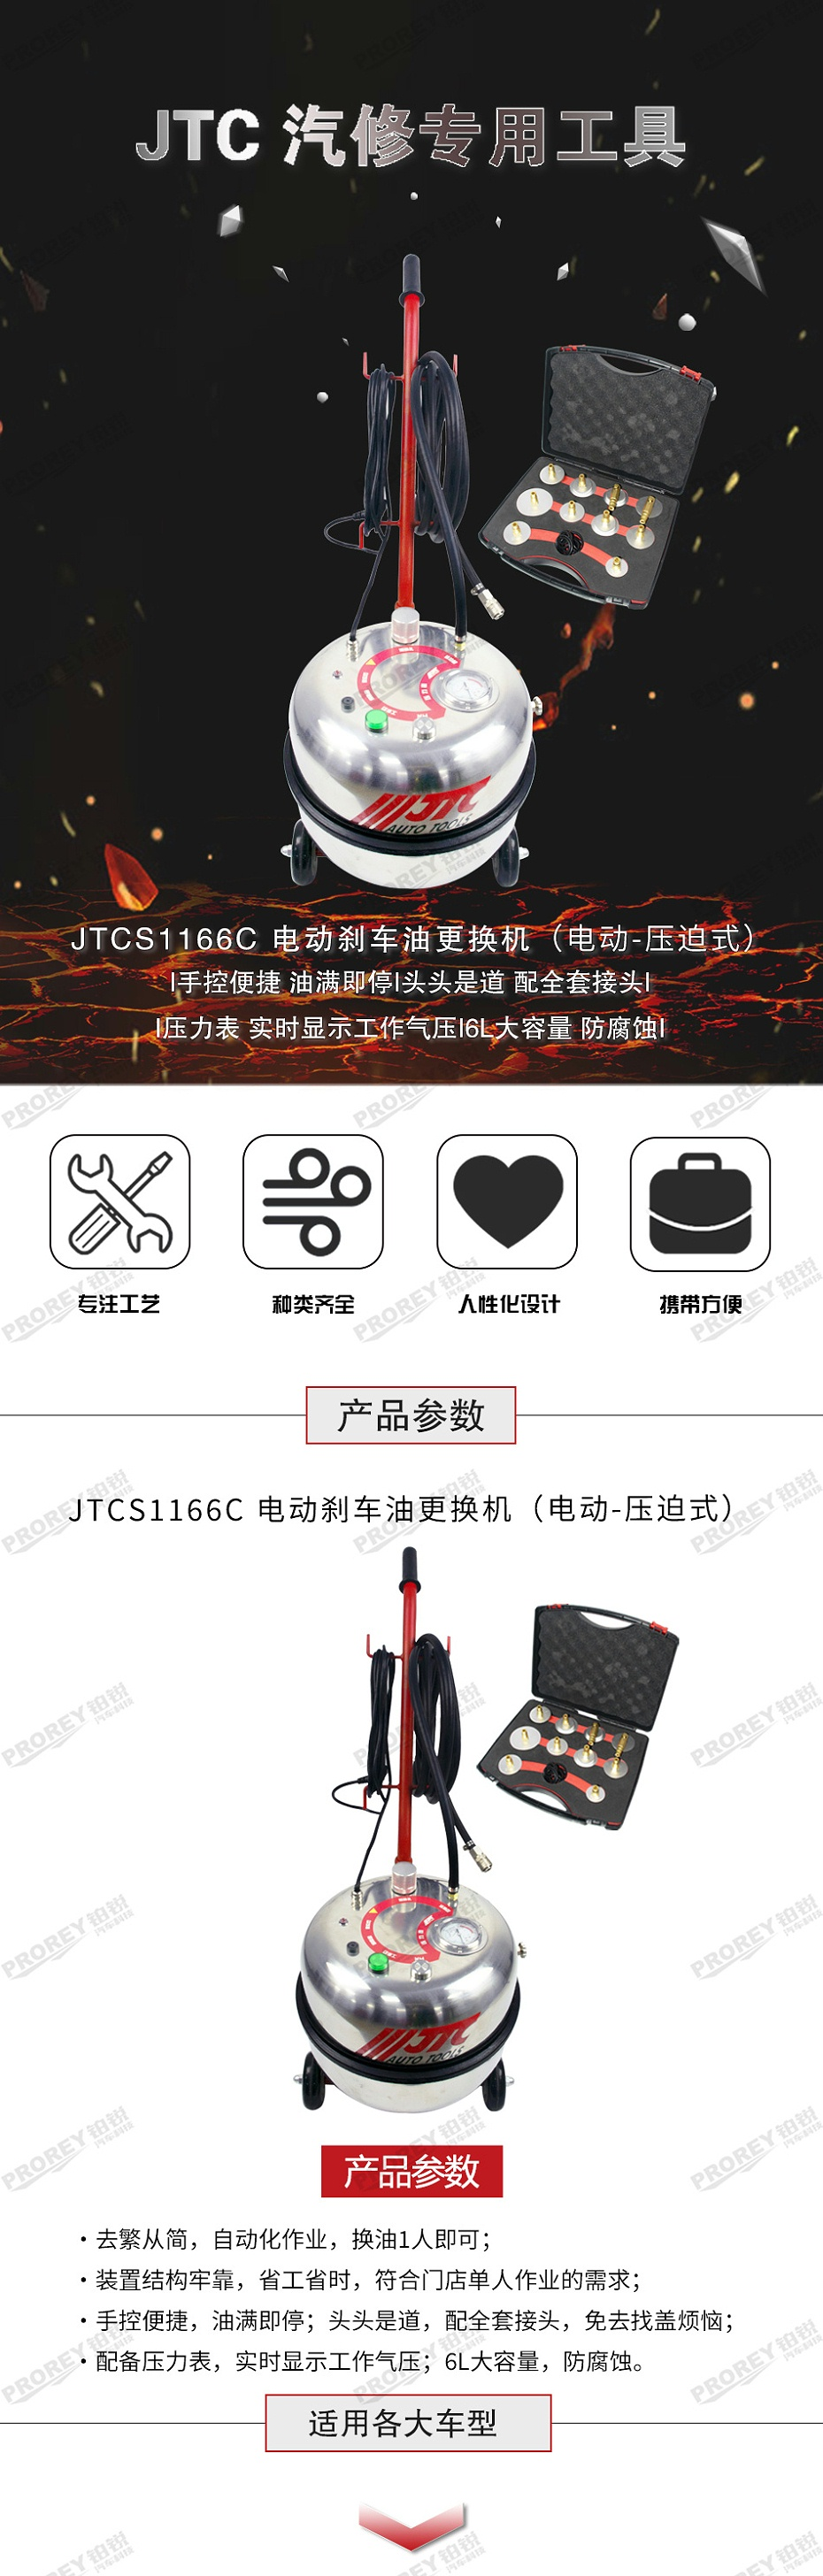 GW-170030046-JTCS1166C-电动刹车油更换机配全套接头-1